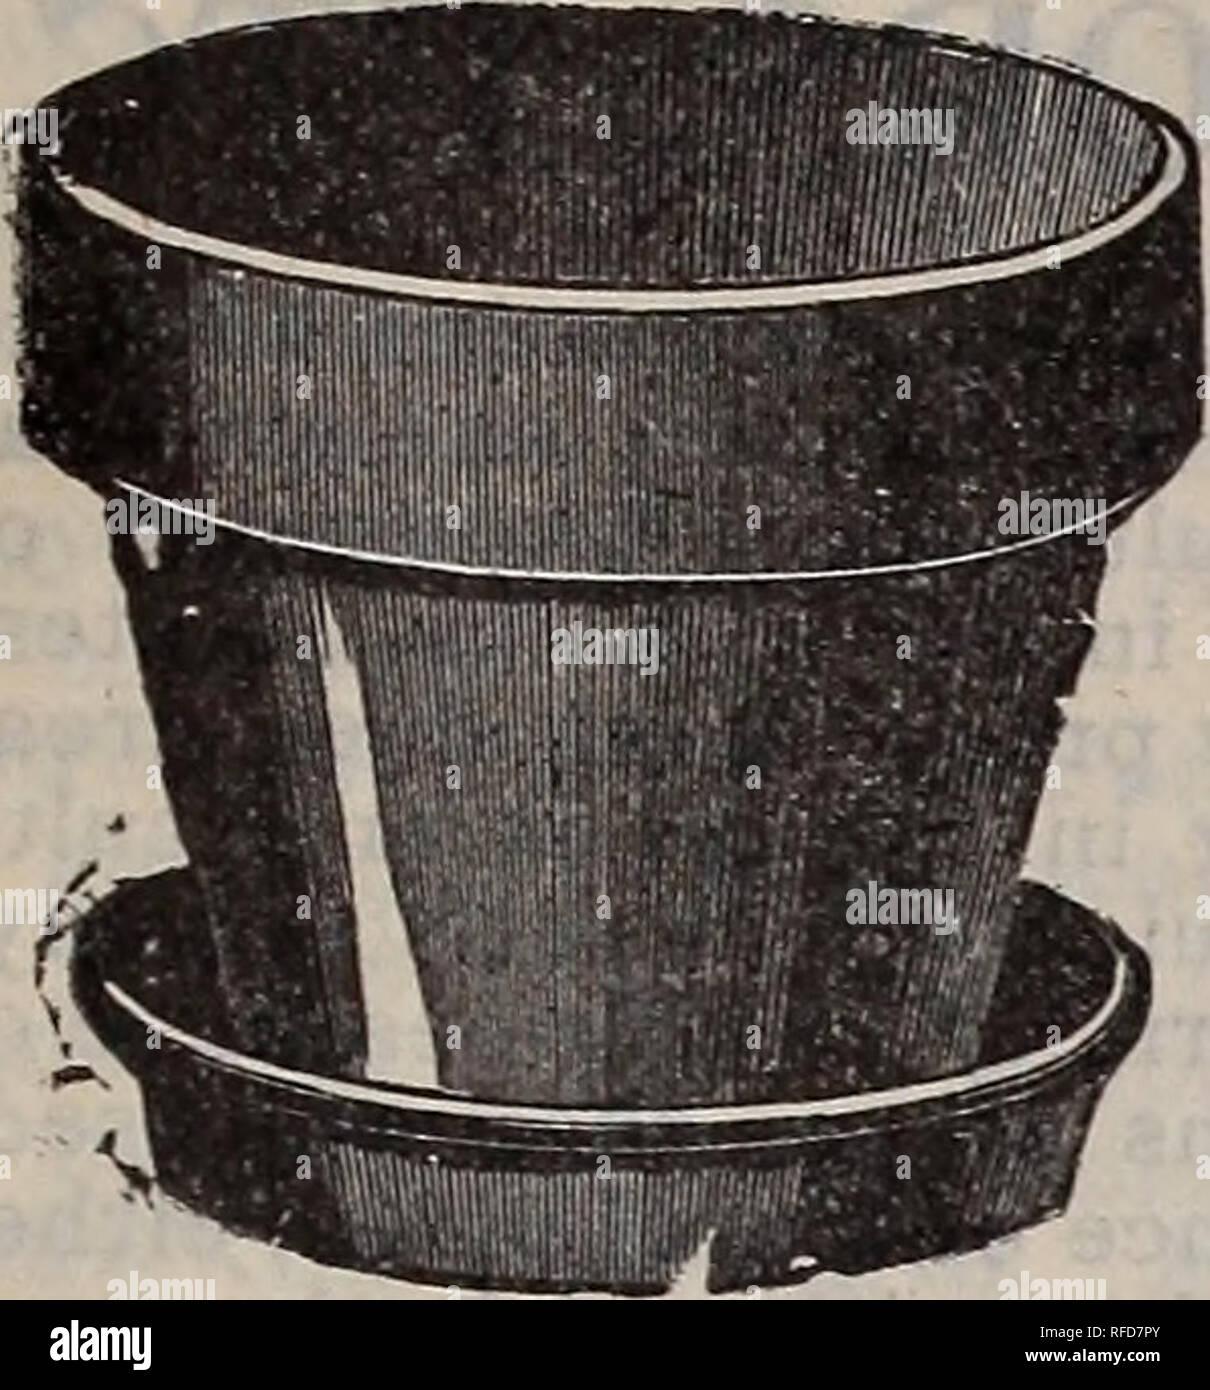 Descriptive catalogue : Wood's high grade seeds and guide